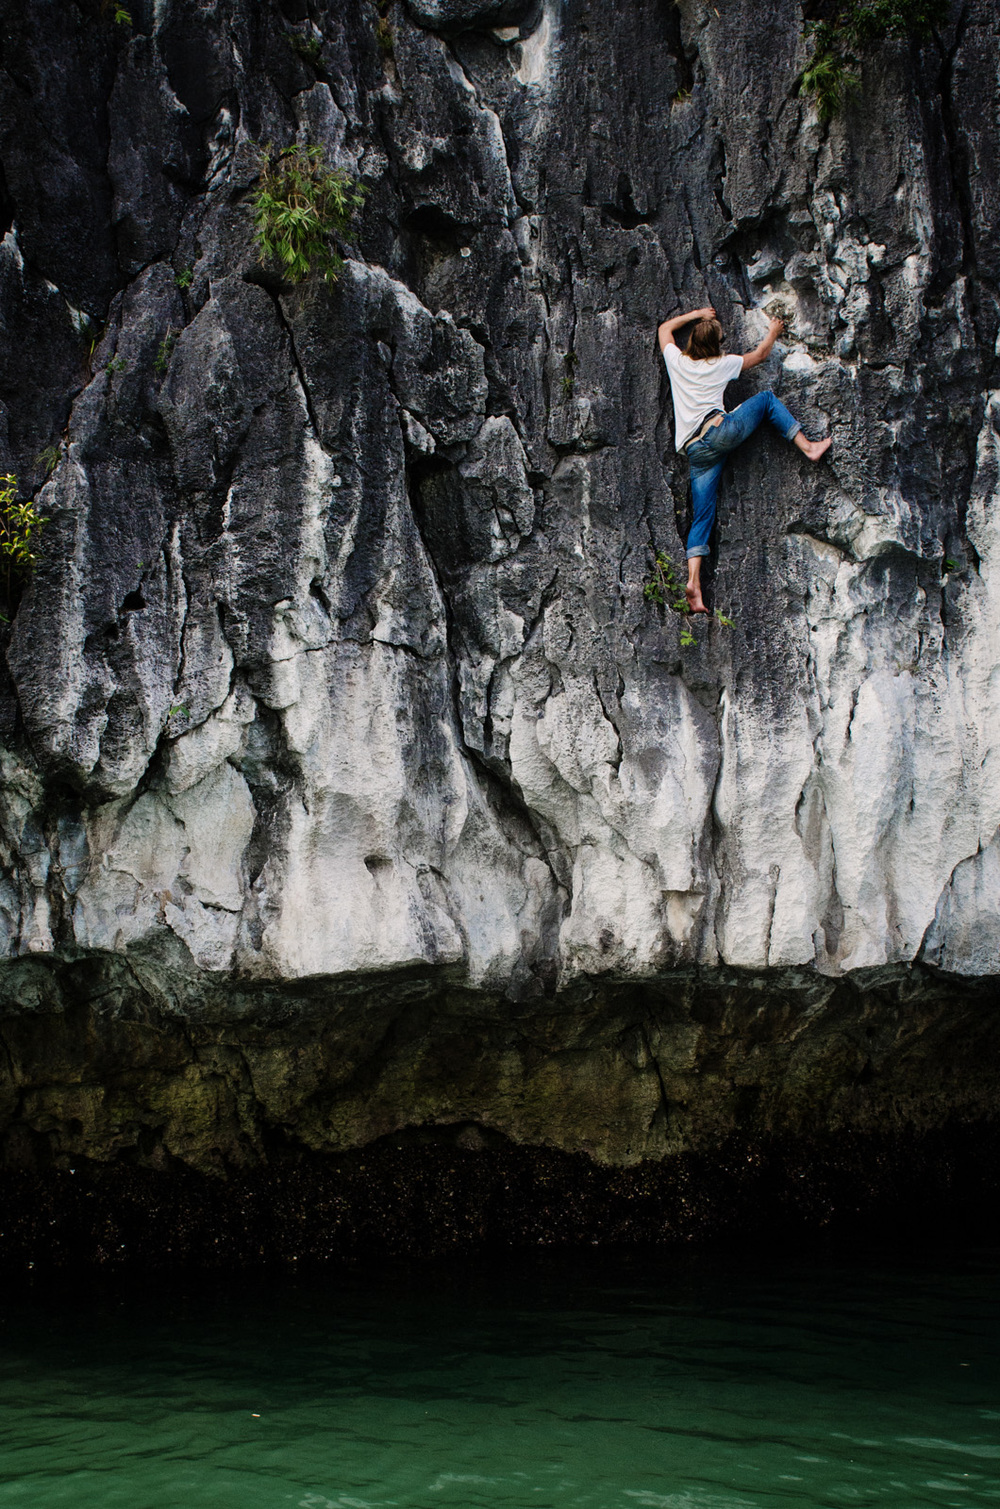 RockClimbing-AsiaOutdoors-HalongBay-Vietnam-61.jpg